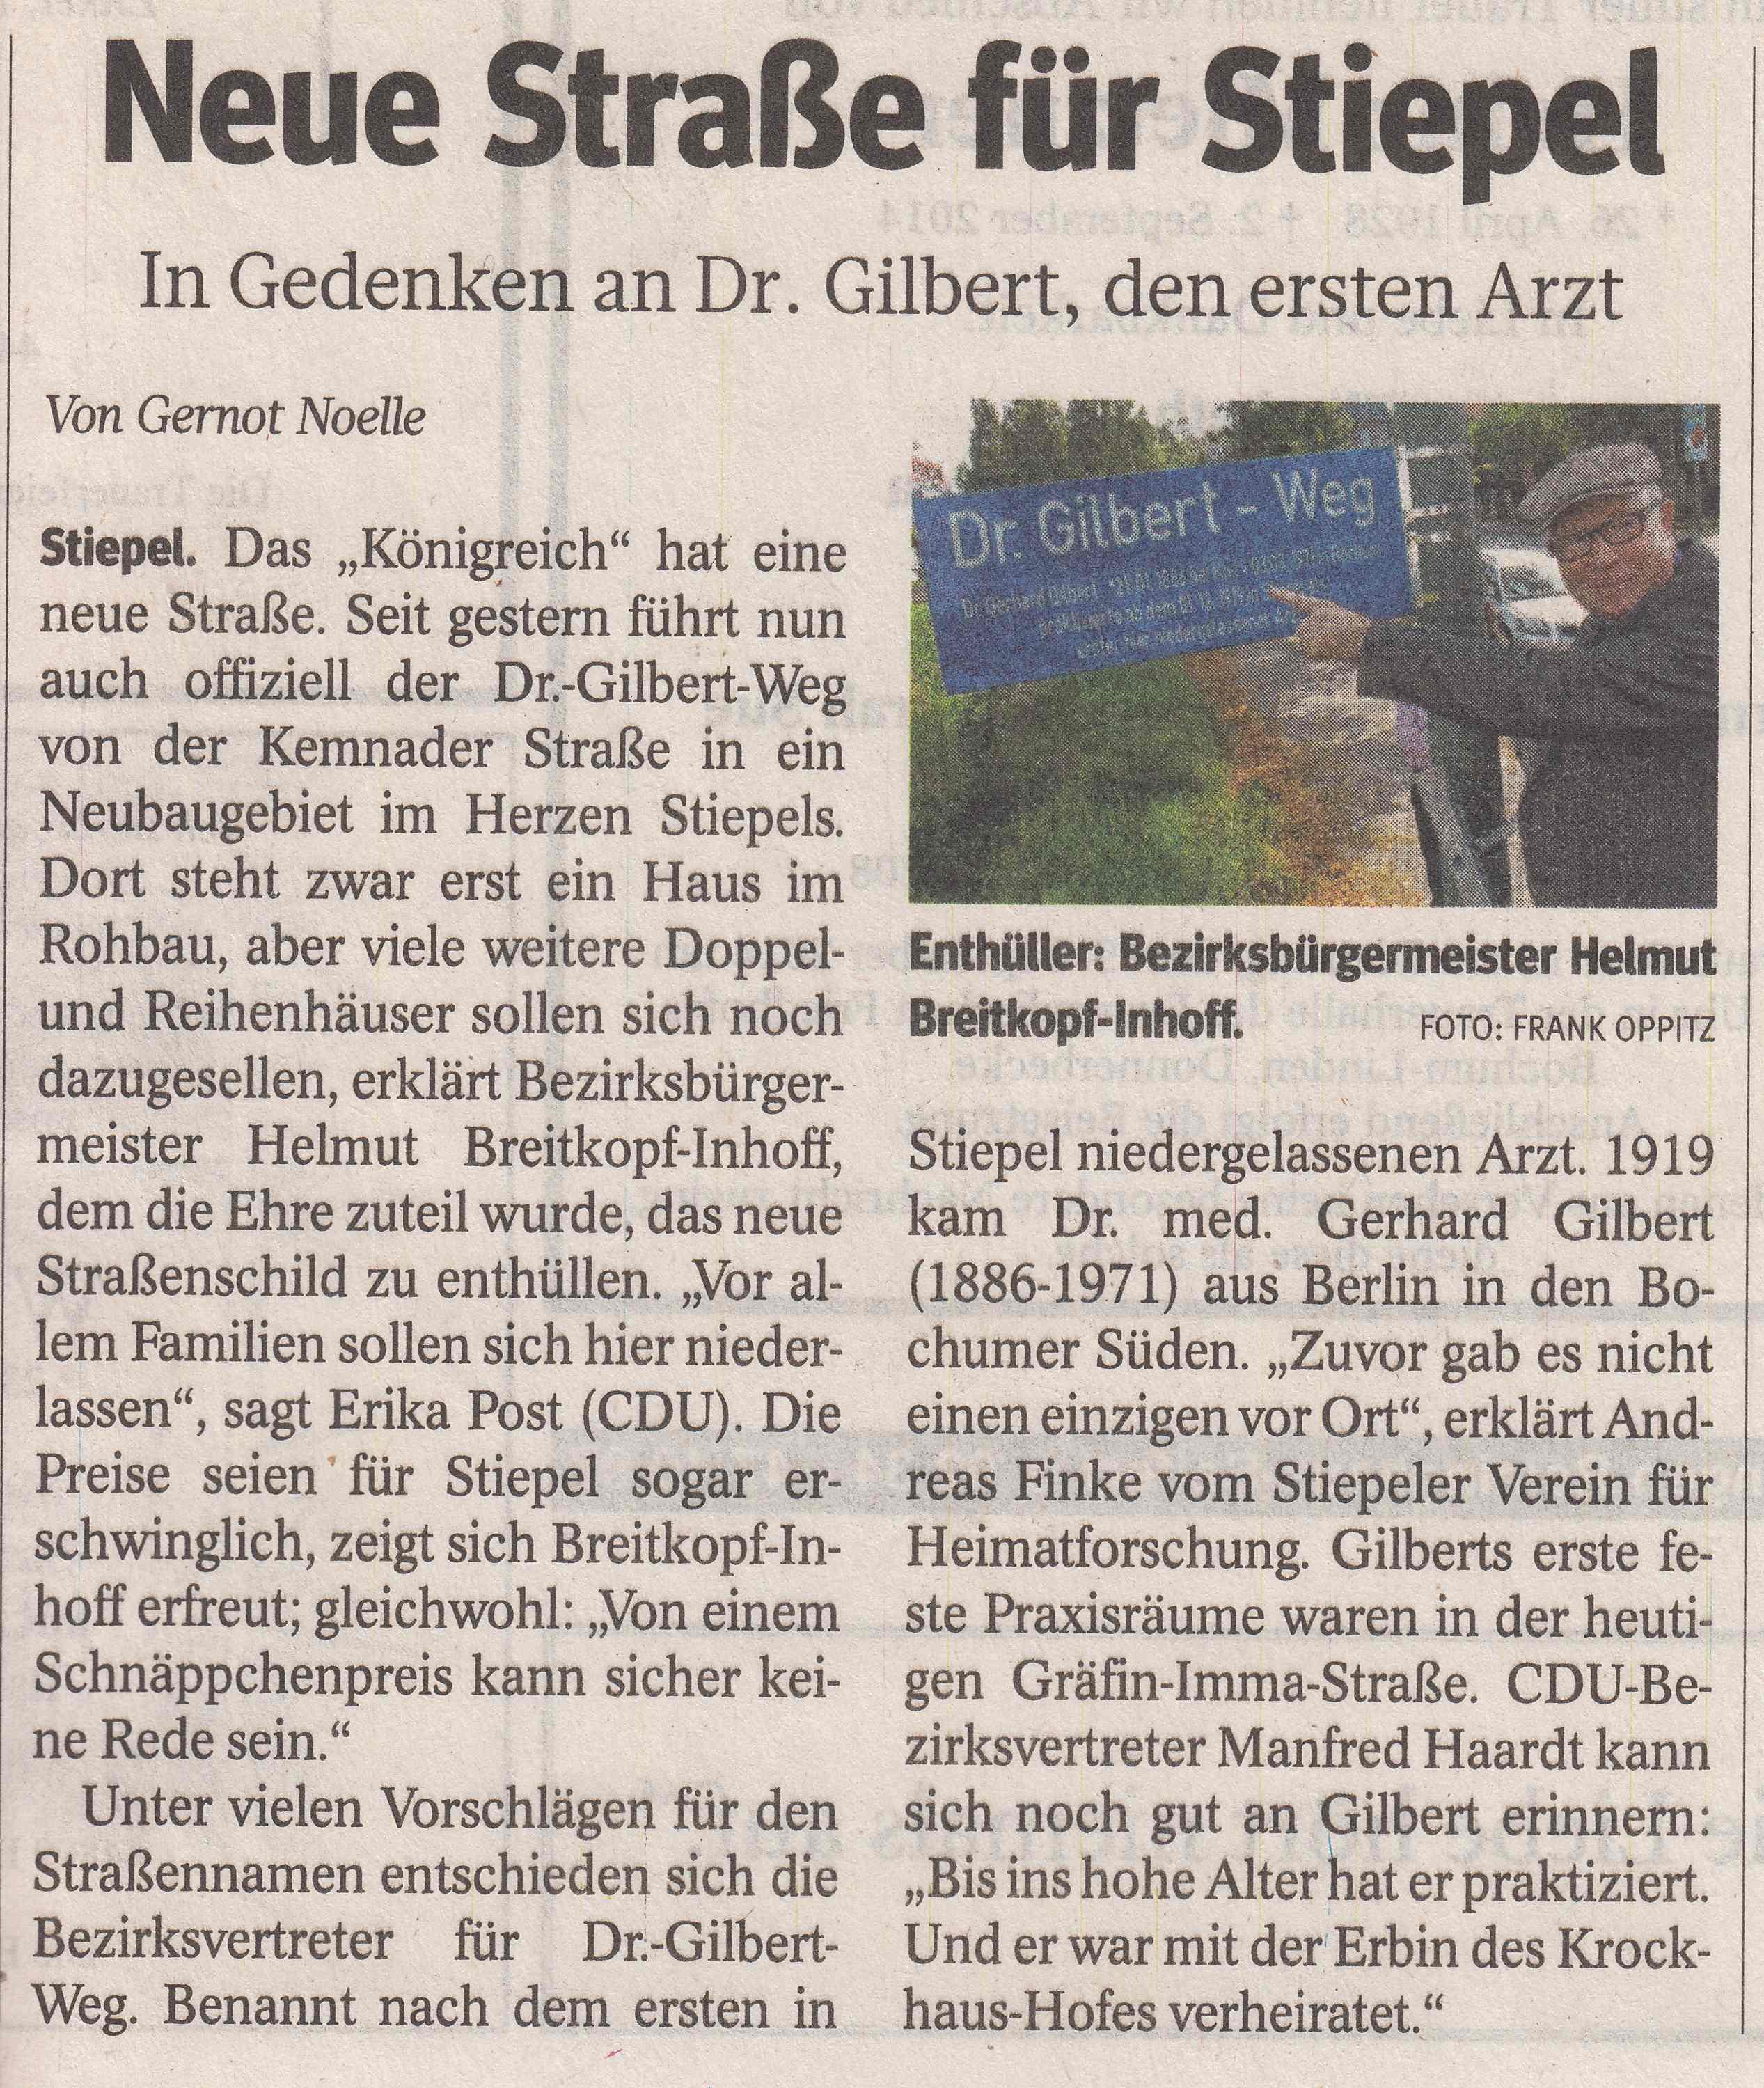 Dr. Gilbert-Weg - Strasseneinweihung